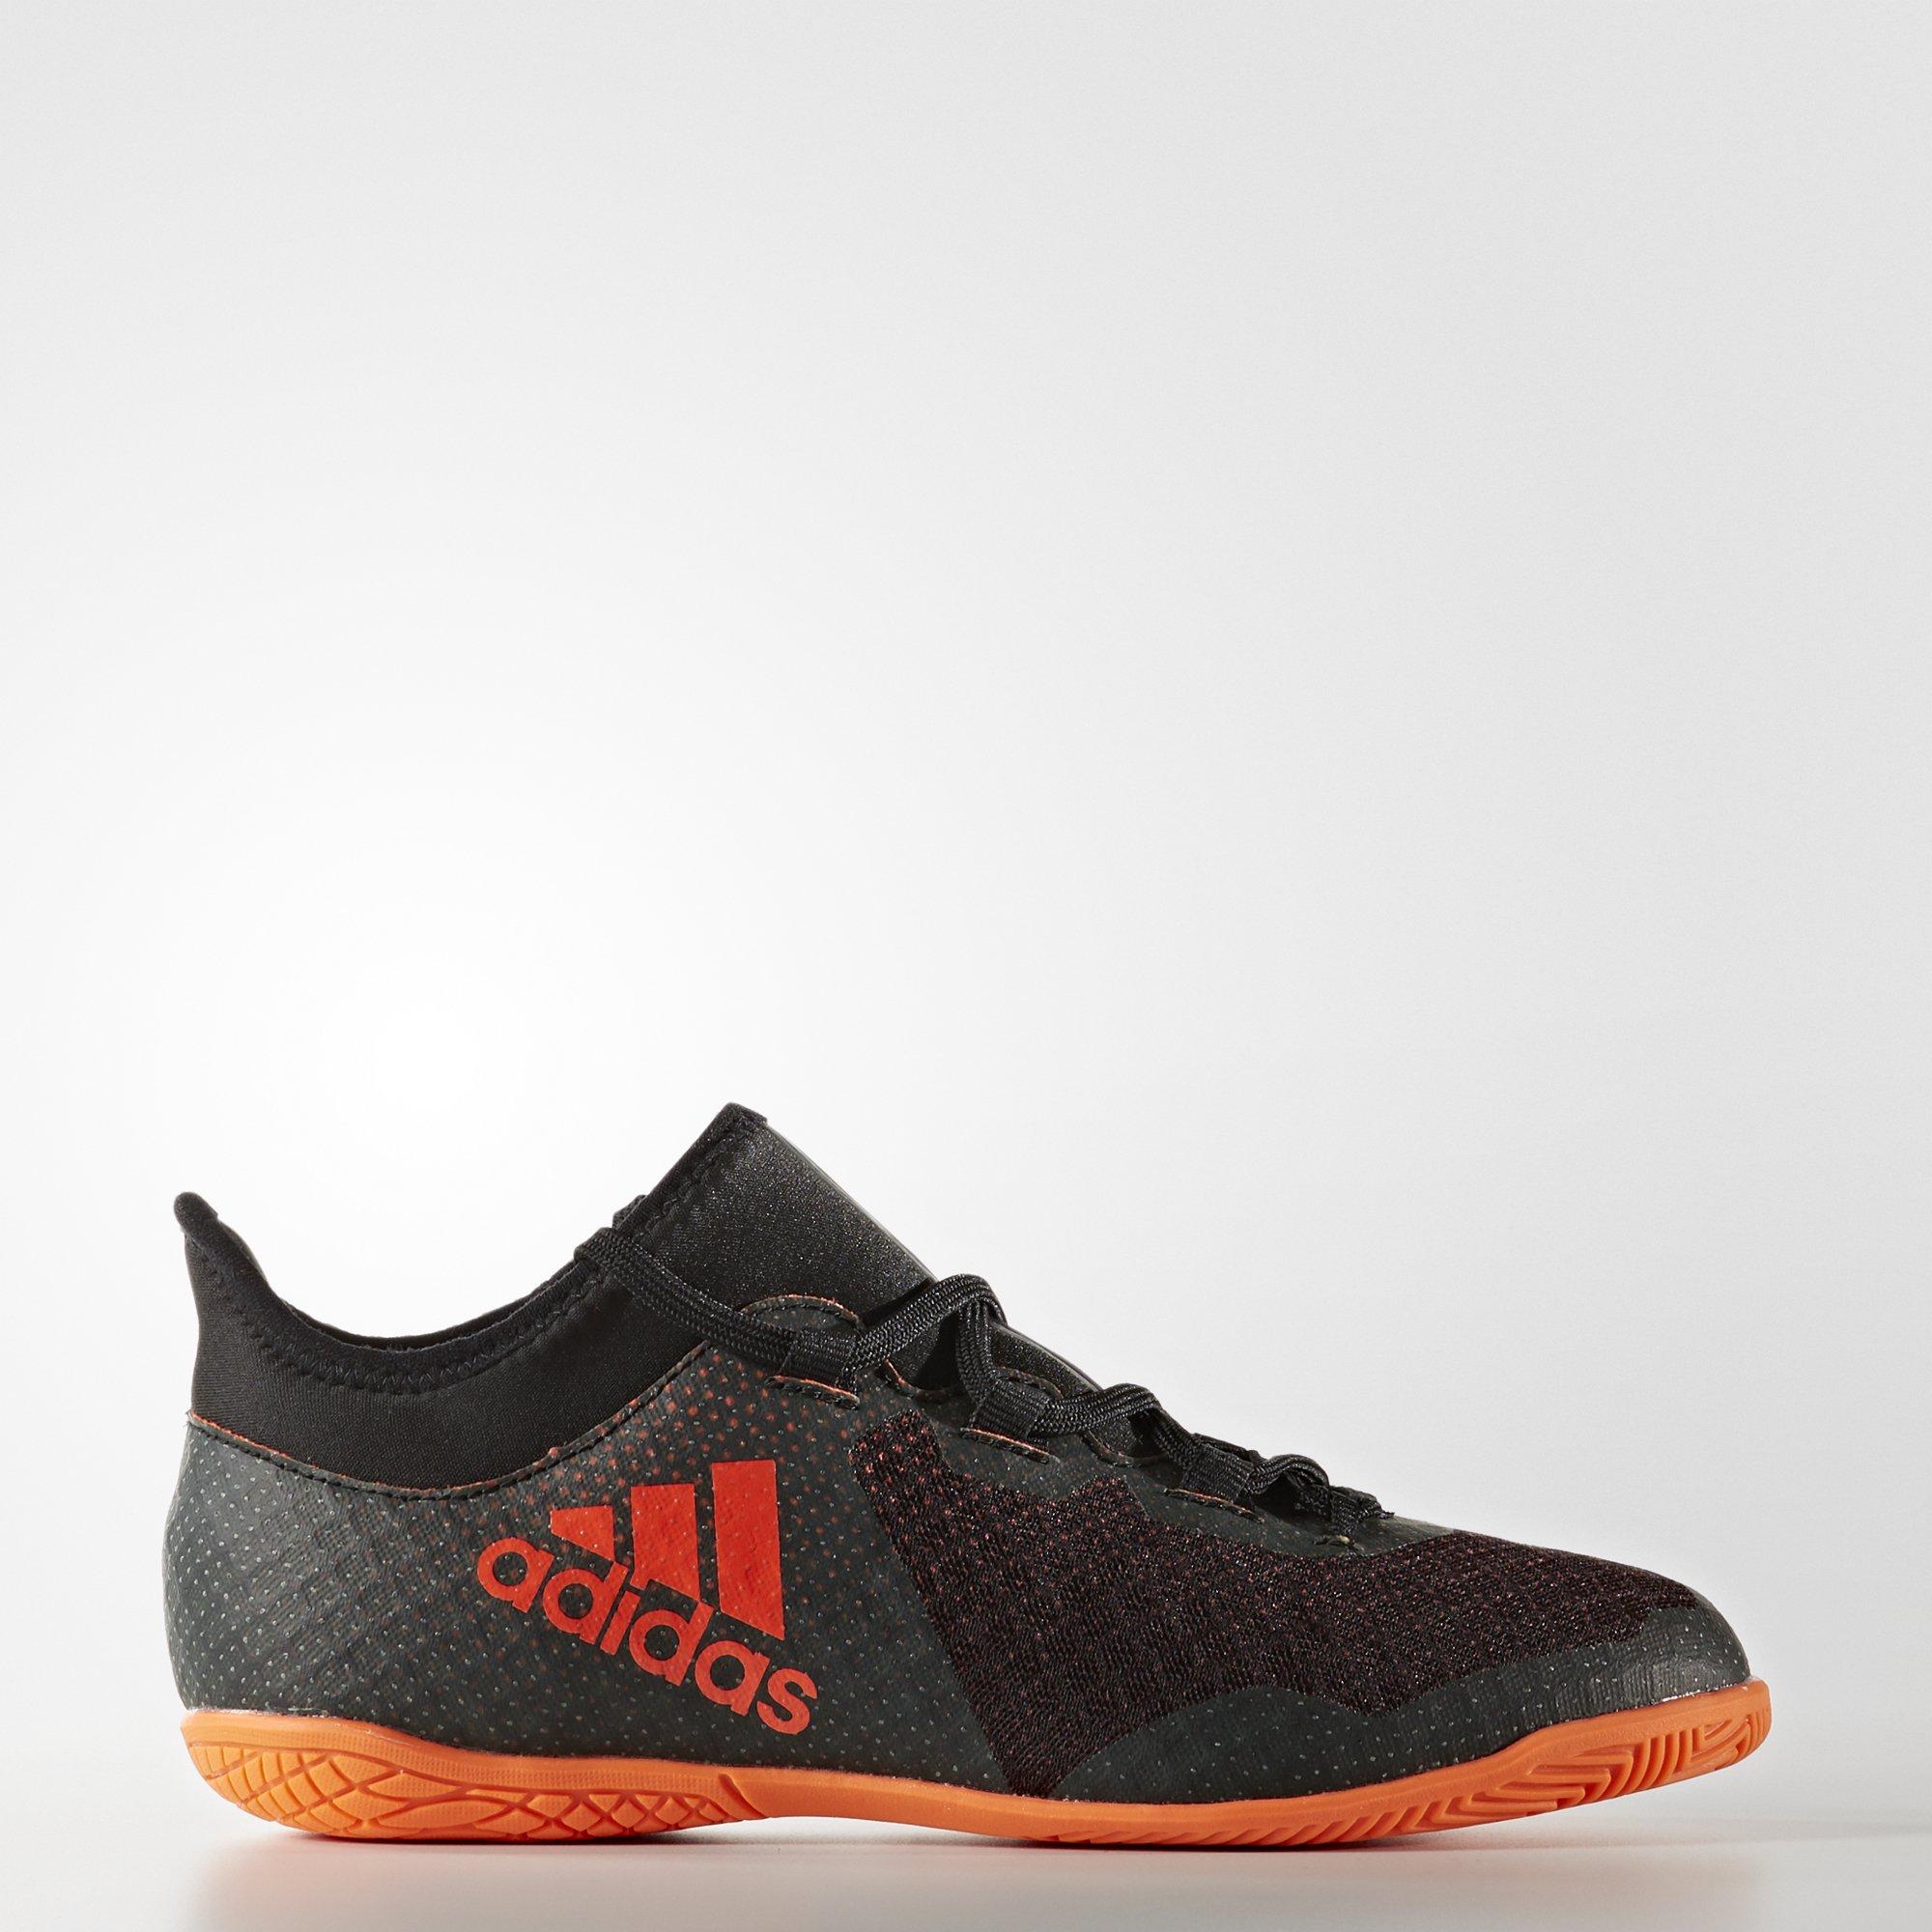 becdbdd15fce0 adidas :: adidas Performance :: Buty piłkarskie :: Pyro Storm ...